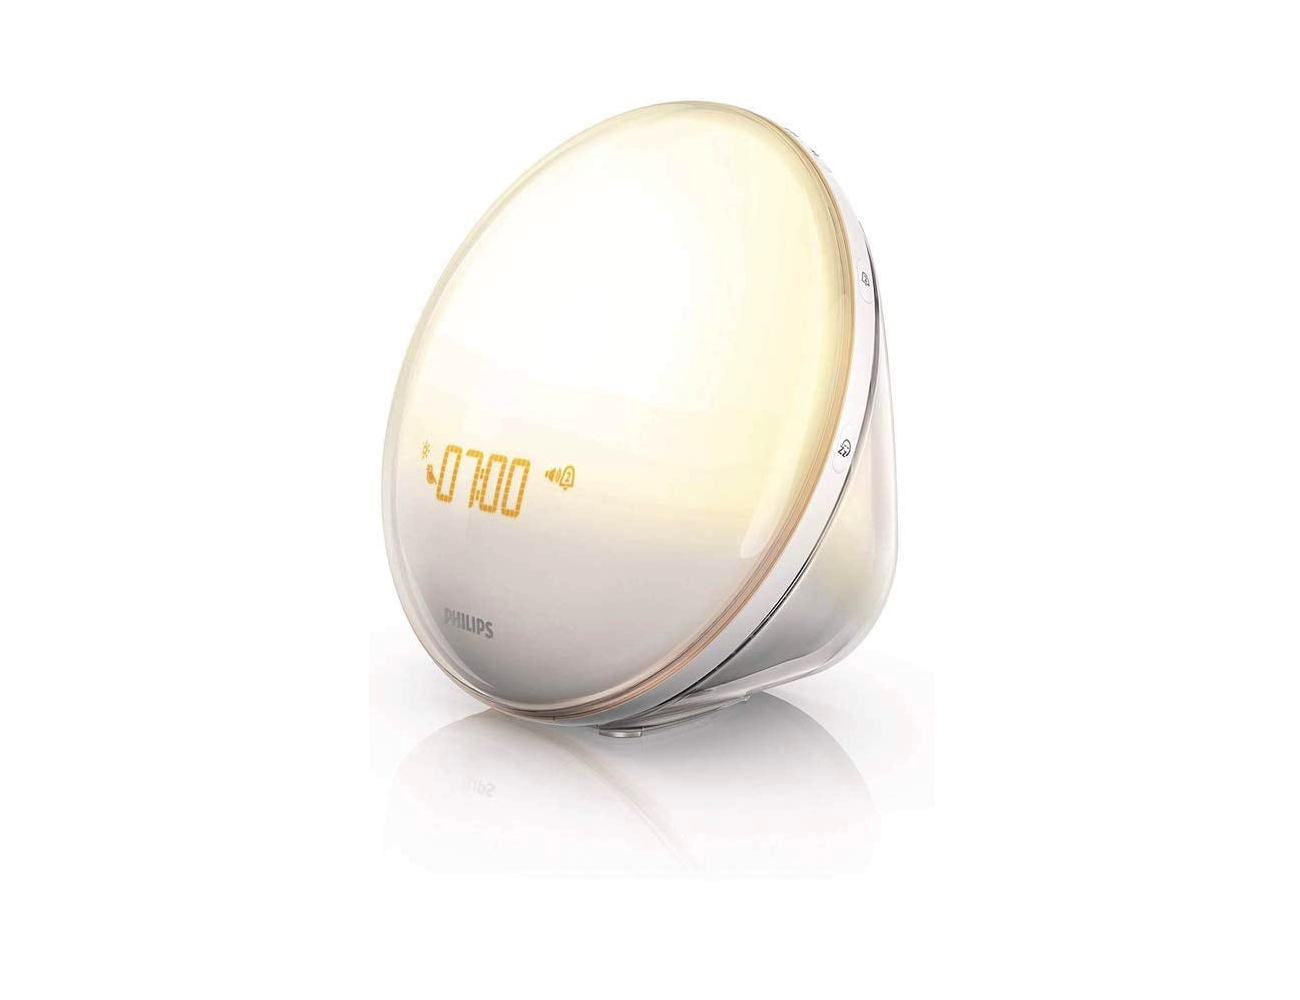 philips hf3520 wake up light alarm clock gadget flow. Black Bedroom Furniture Sets. Home Design Ideas